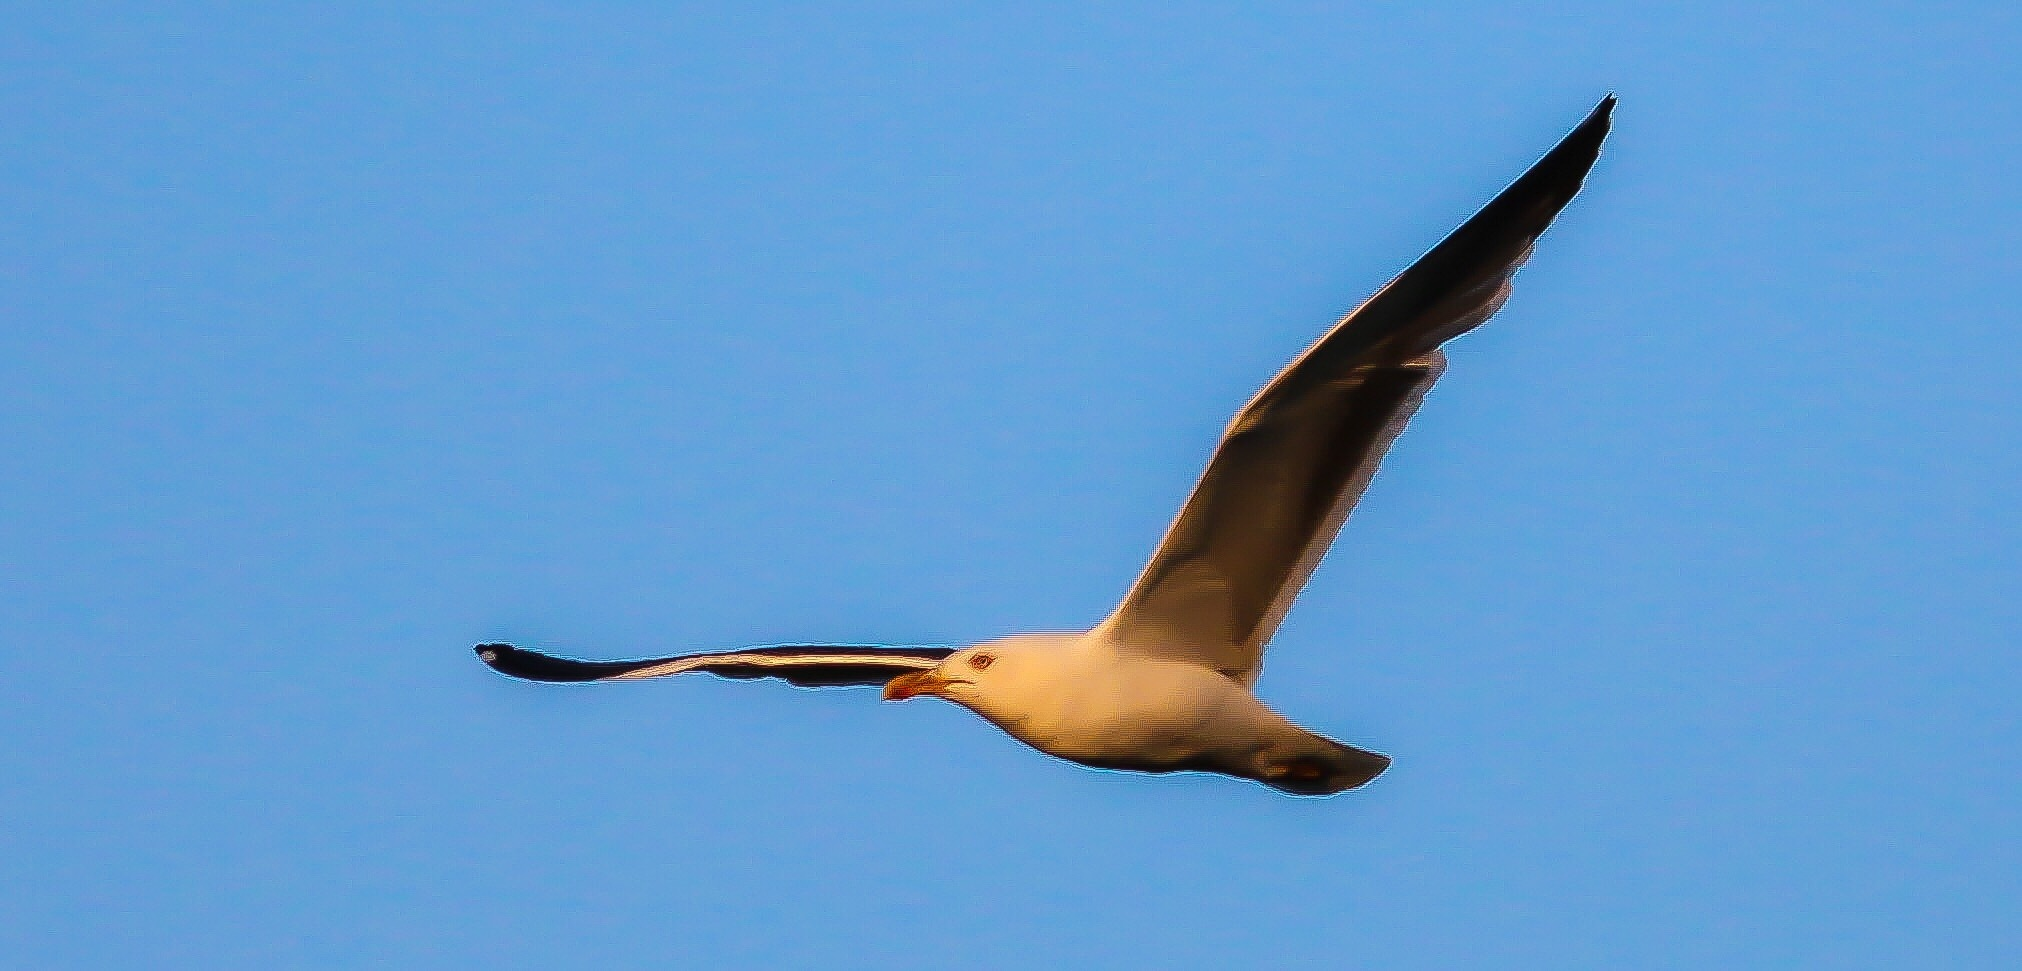 Full flight by Terry Reynolds